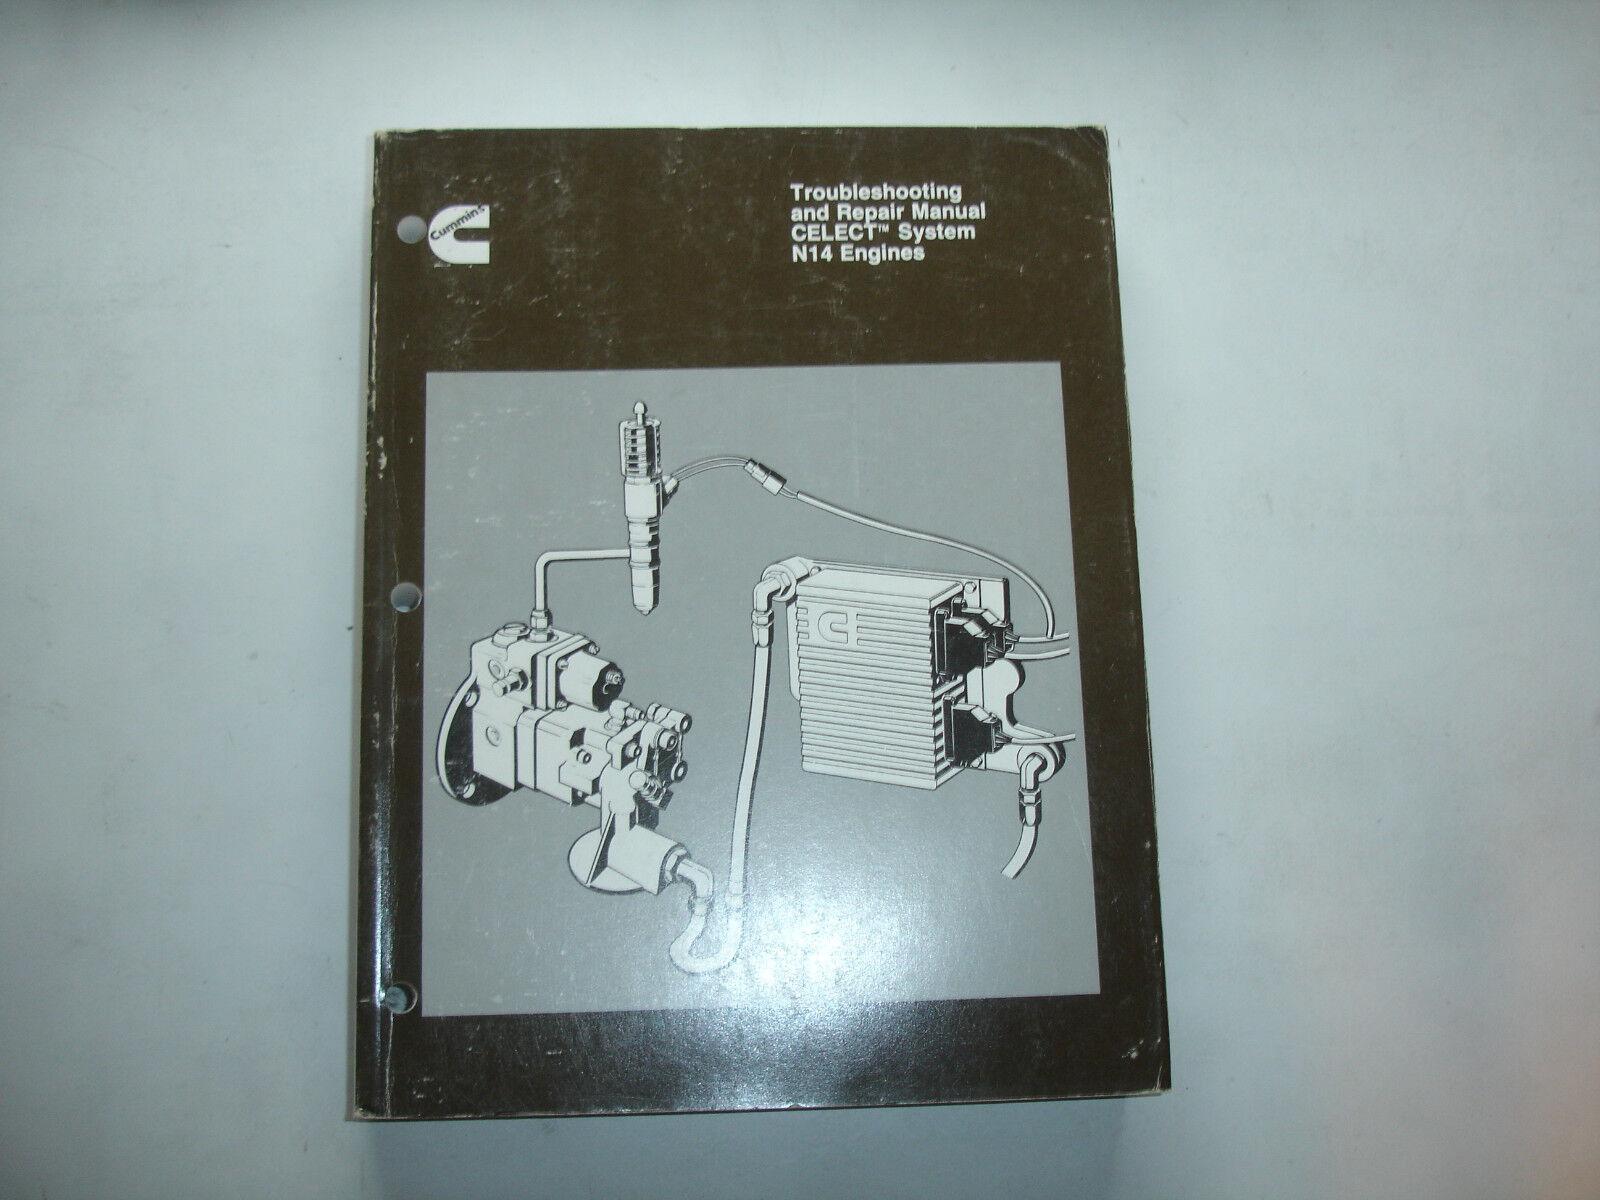 EC Cummins TROUBLESHOOTING & REPAIR Manual CELECT Fuel System N14 ...